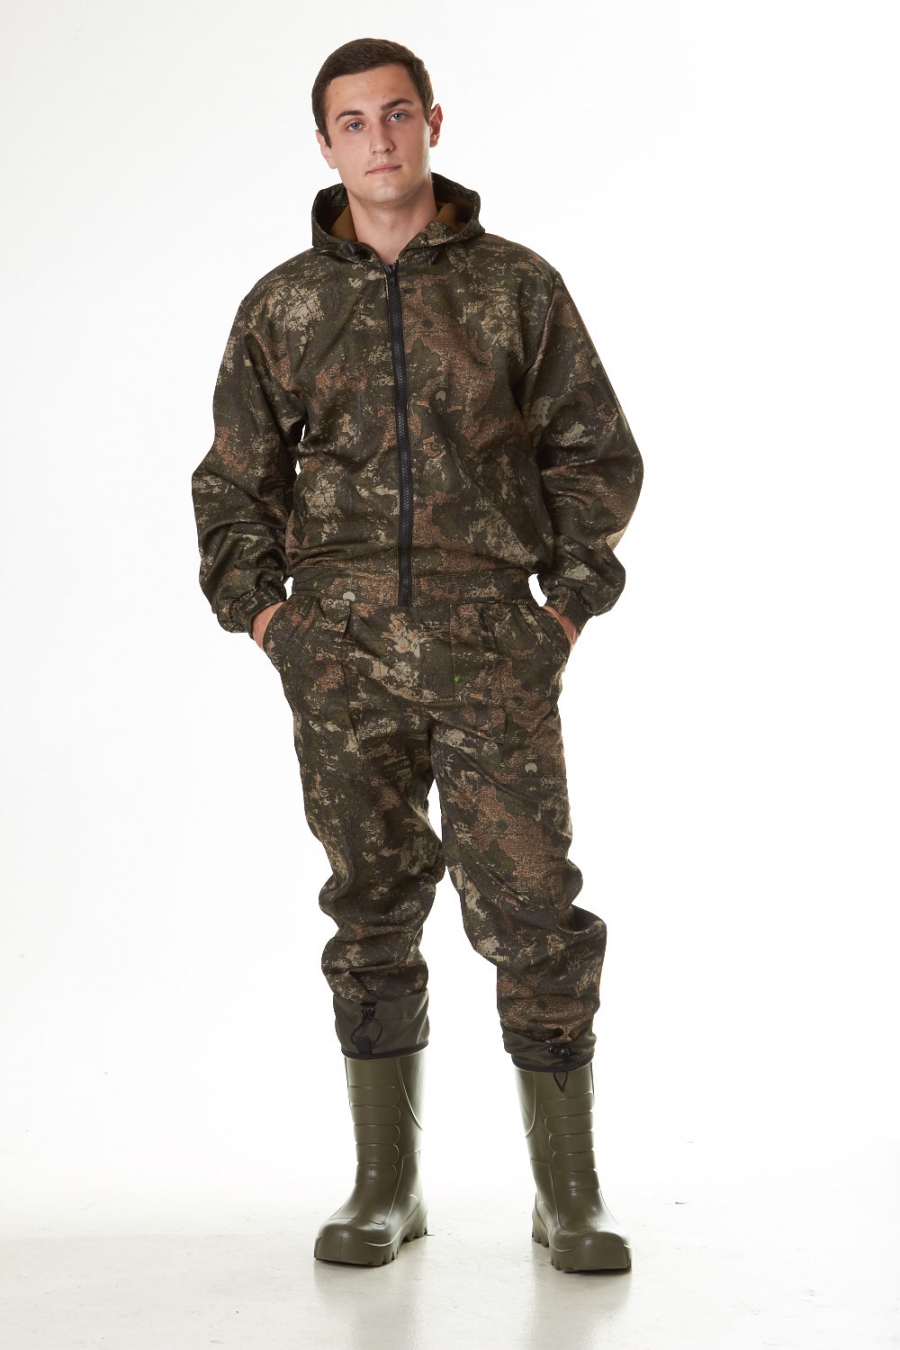 Костюм для охоты и рыбалки ЛесникОдежда для охоты и рыбалки<br><br><br>Размер: 46